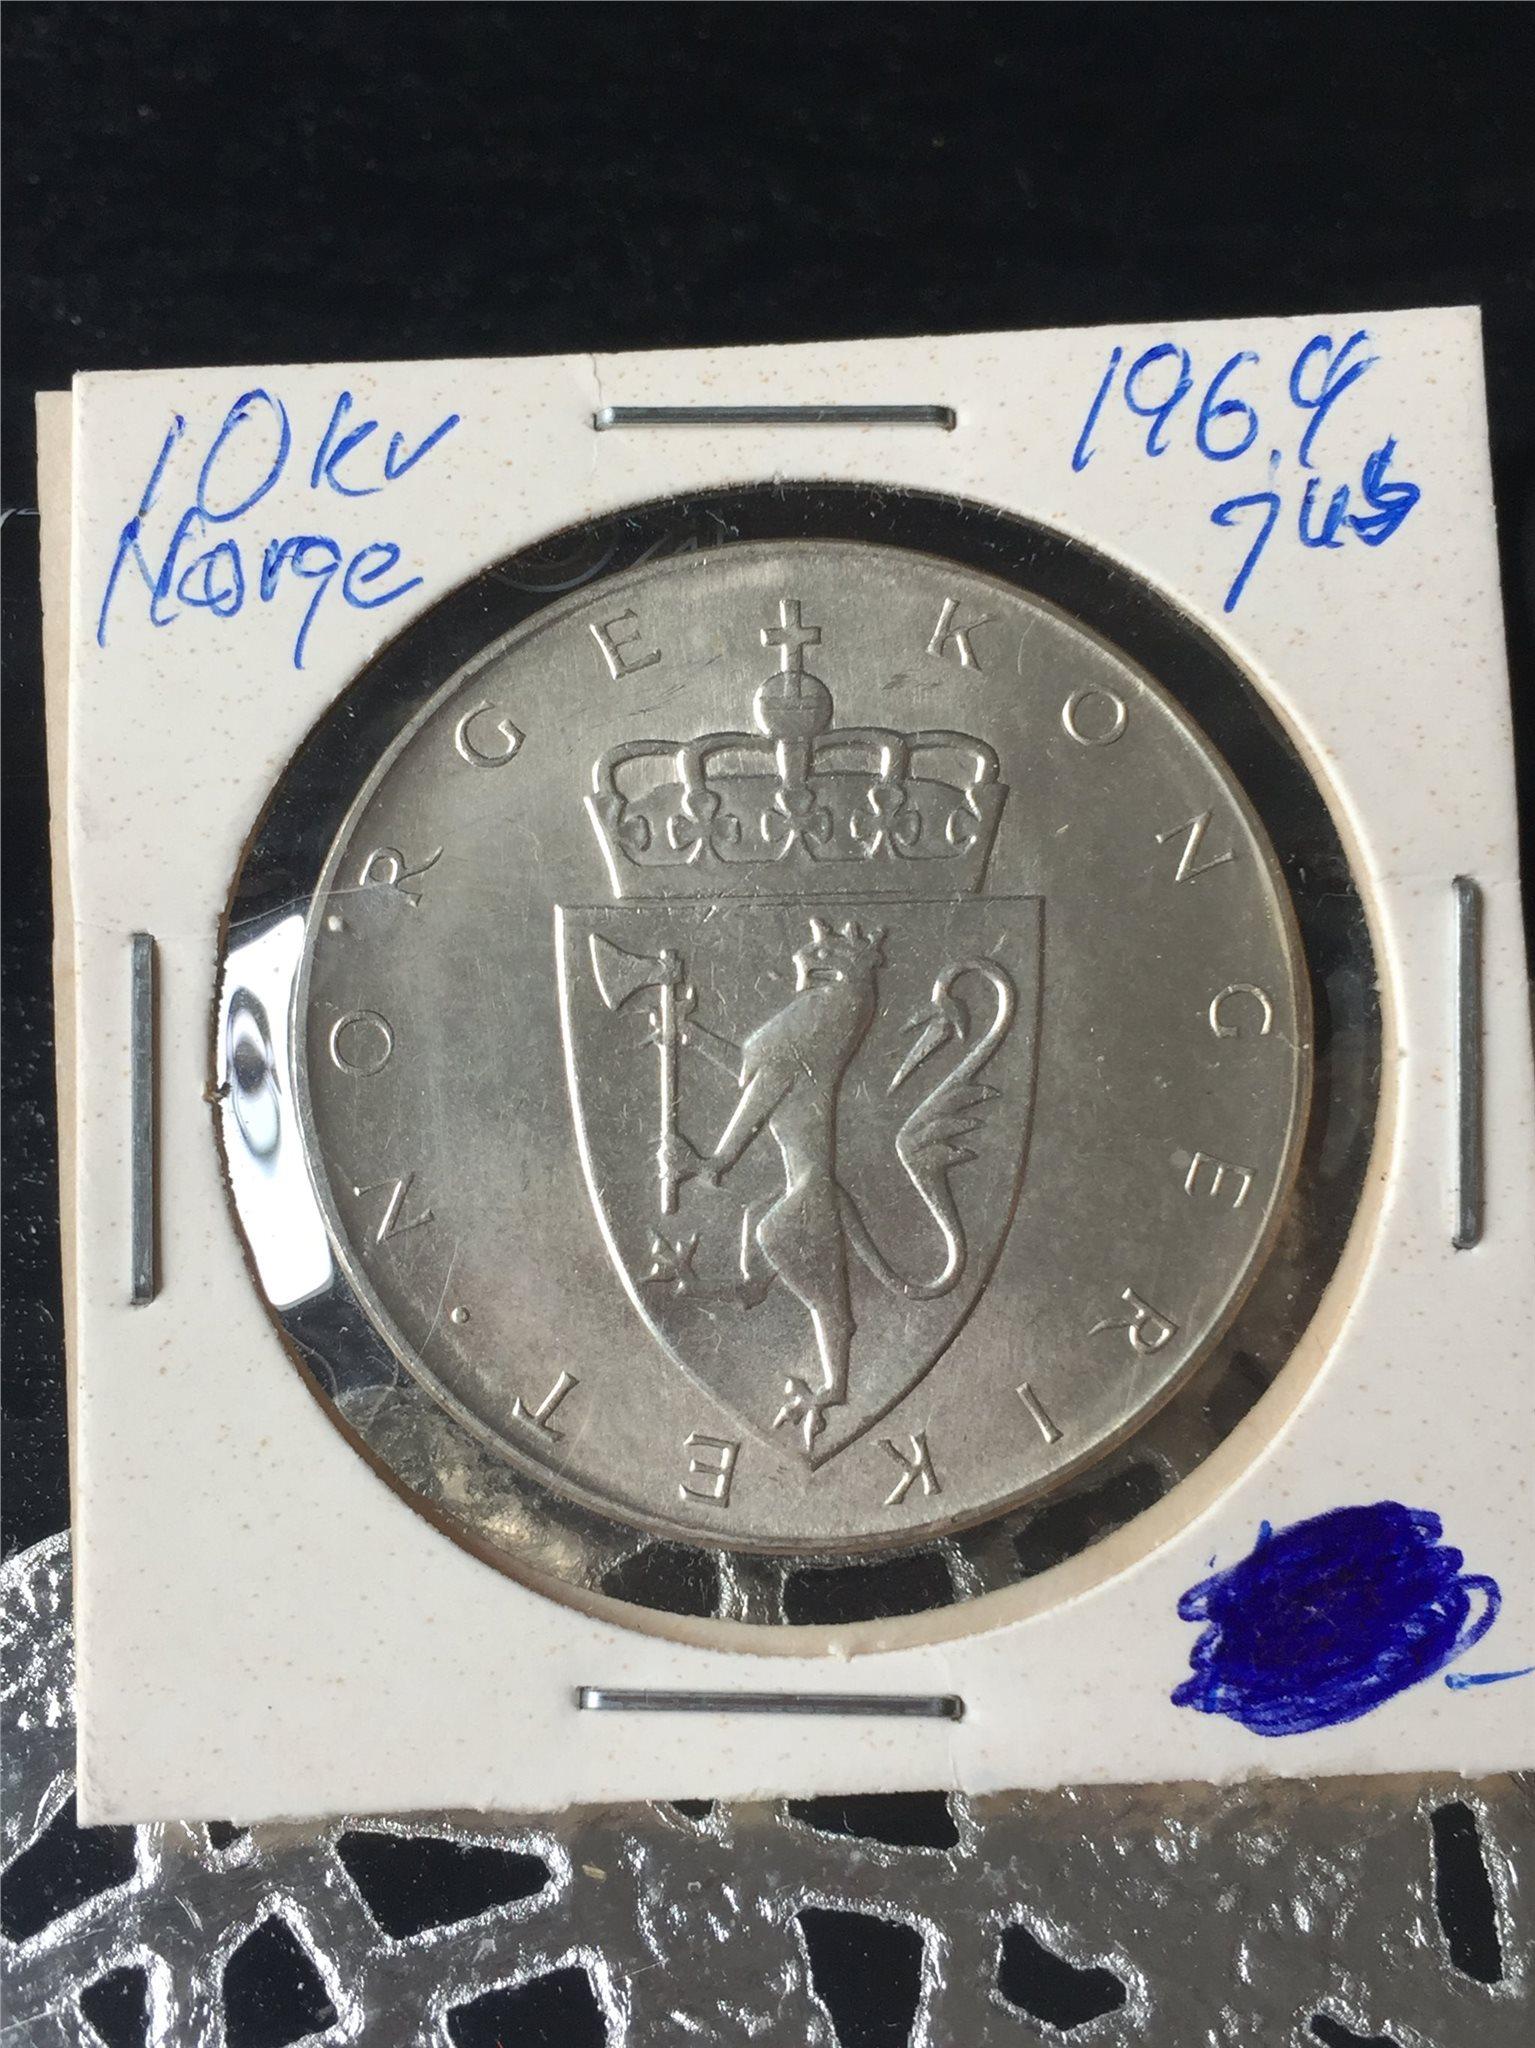 köpa silver i norge